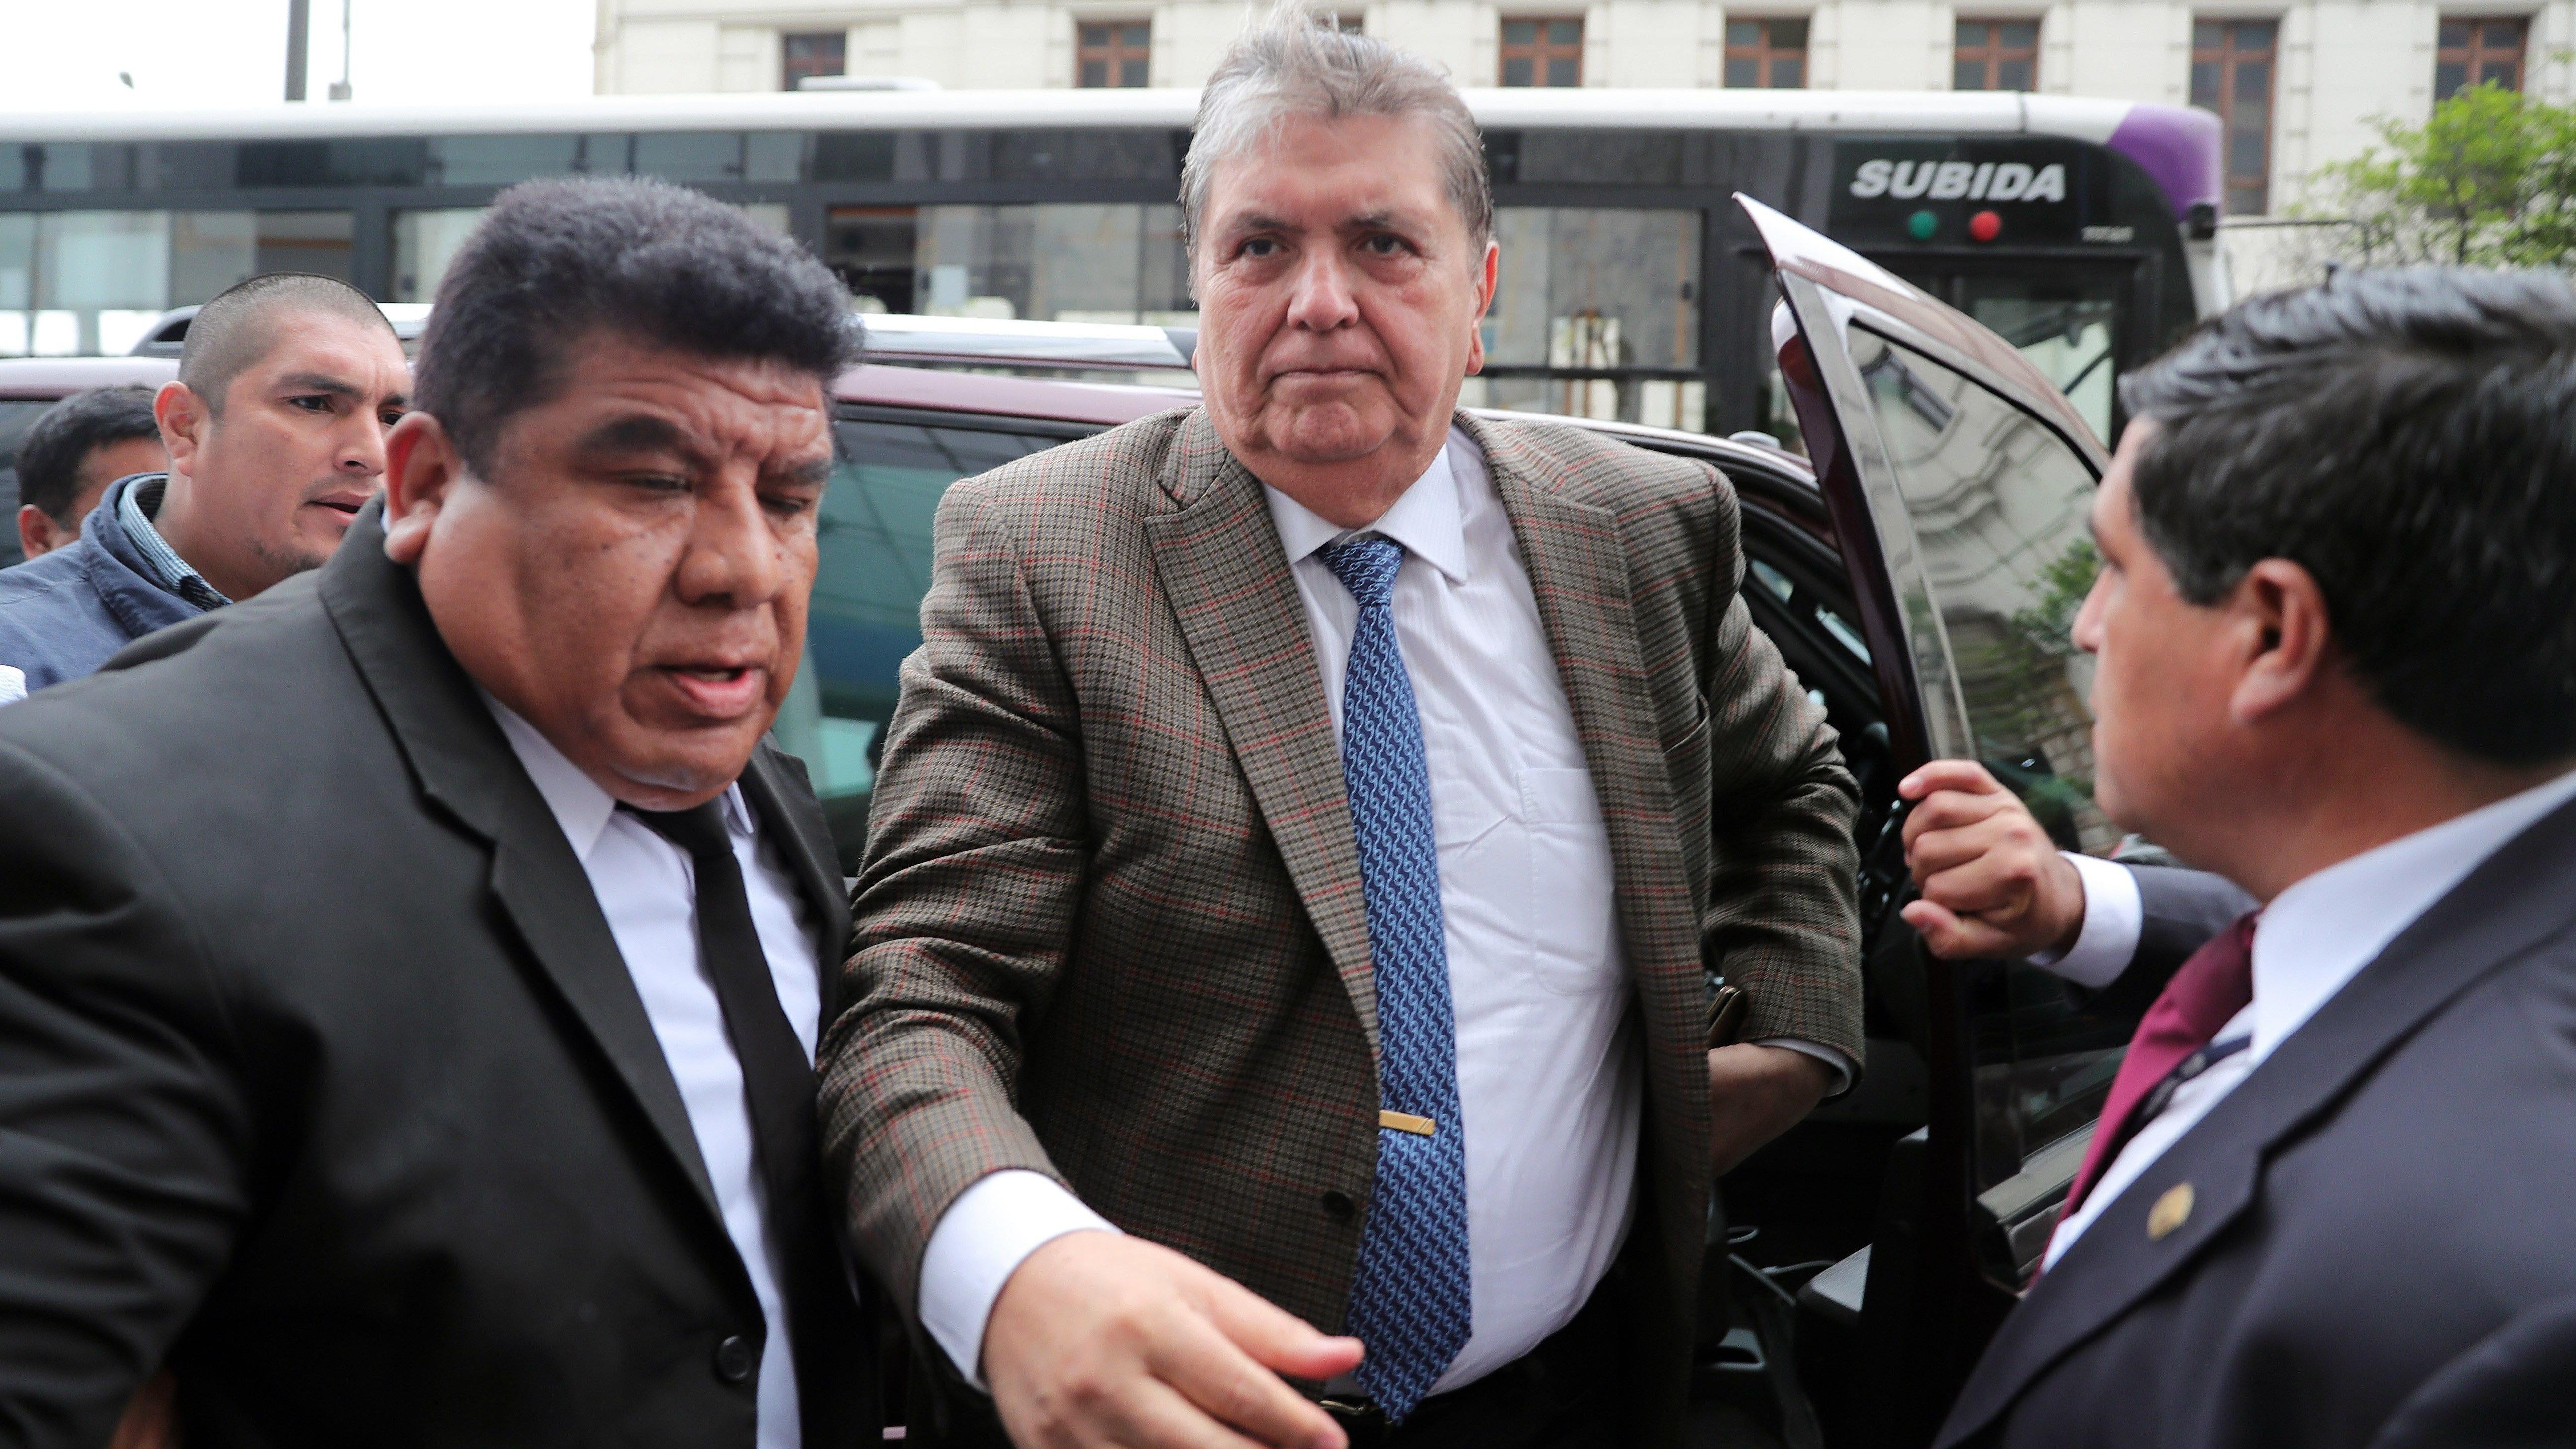 qeweAlan García se pronunció tras recibir la orden de 18 meses de impedimento de salida del país.